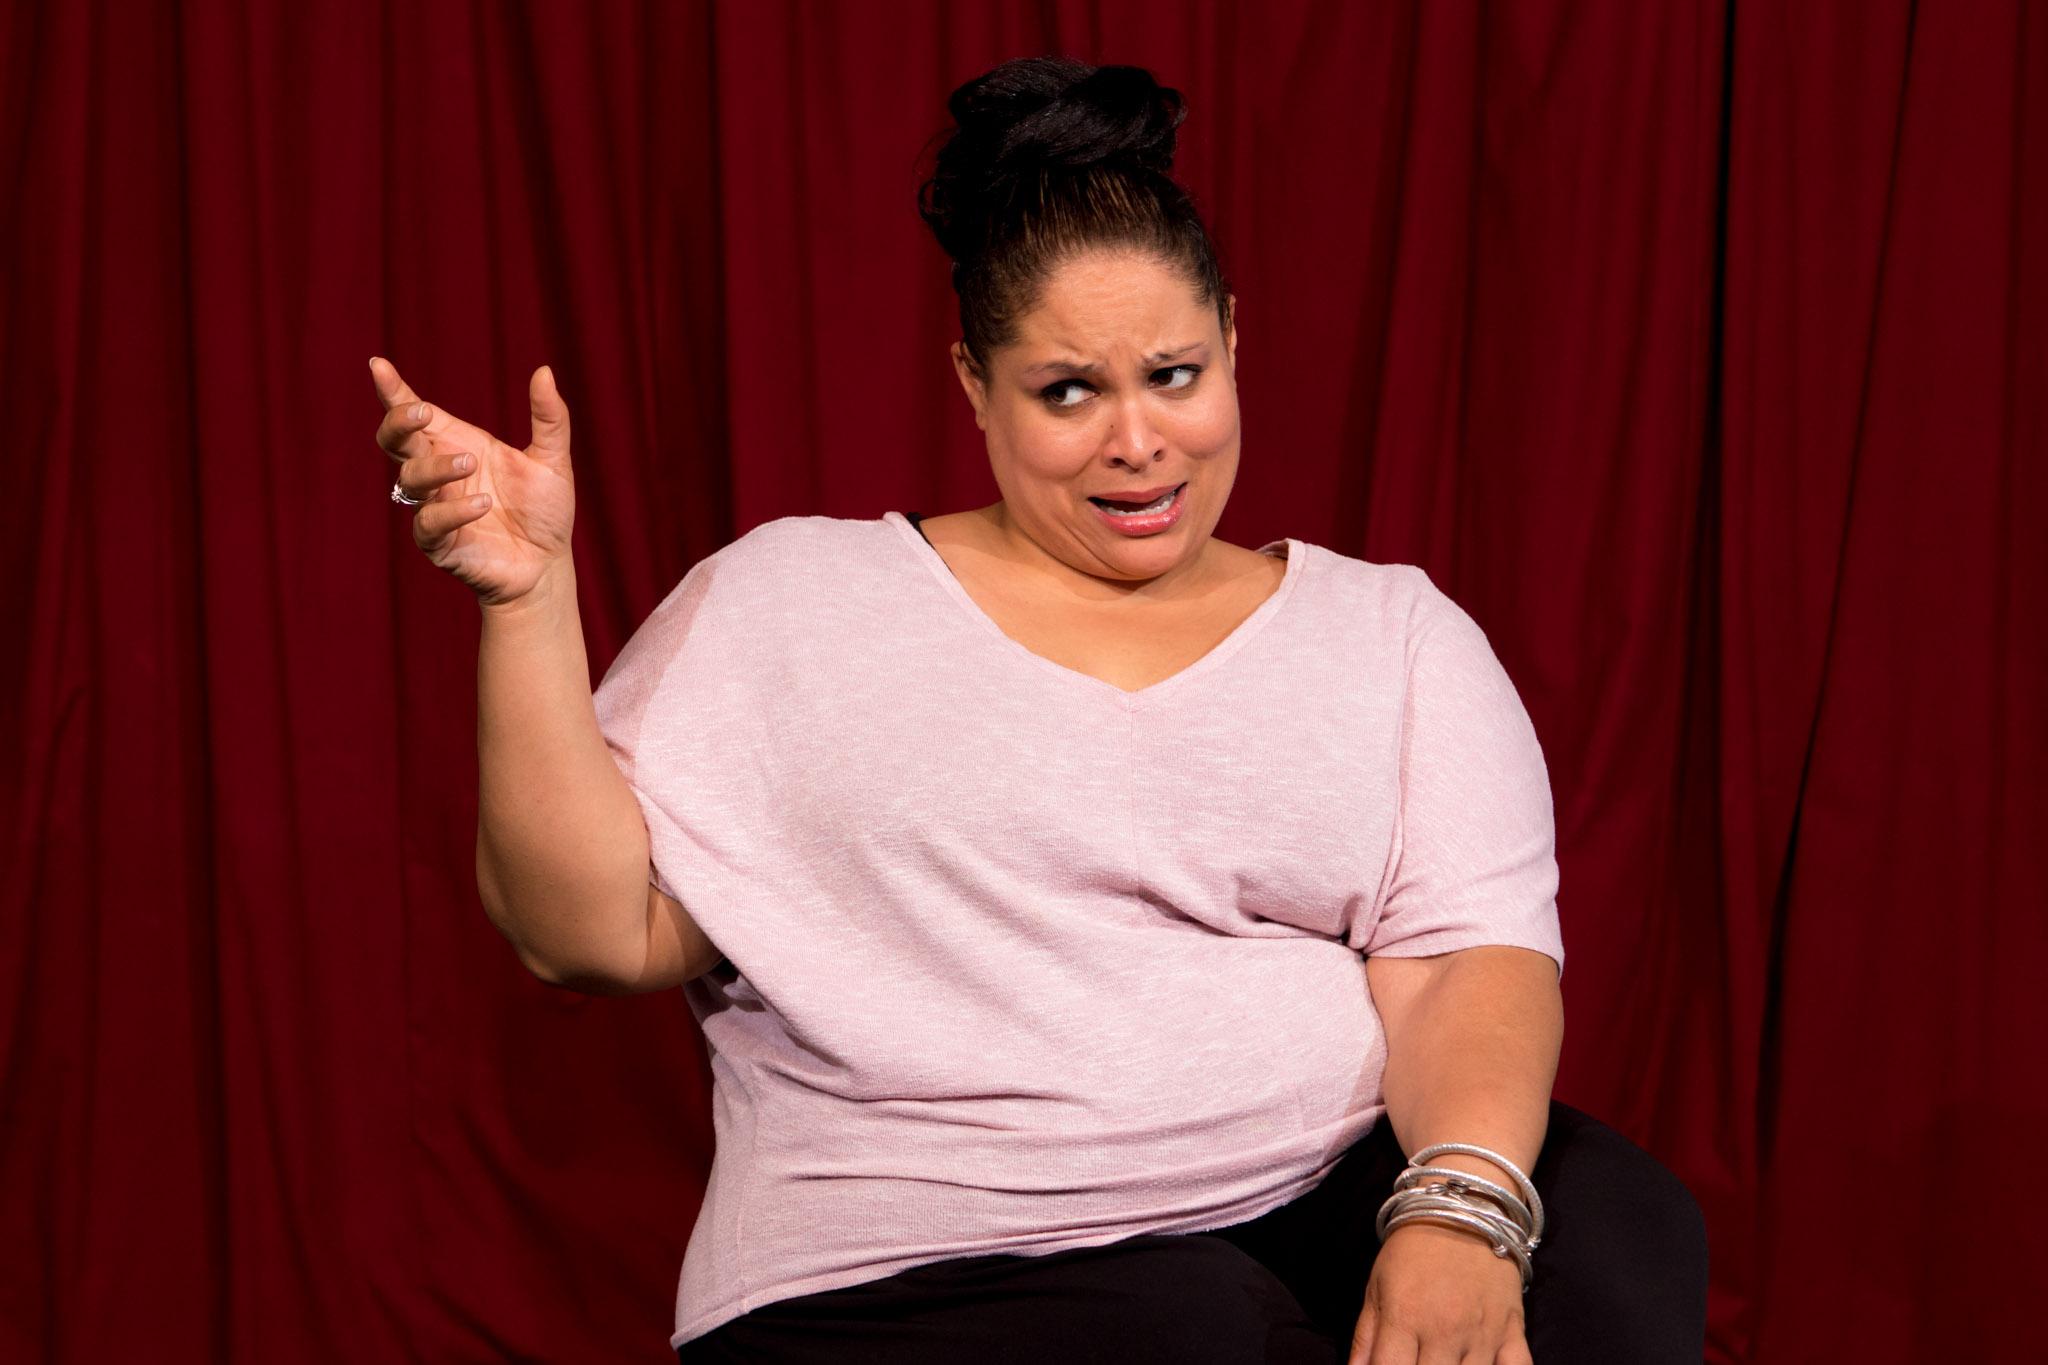 Watch Samira Wiley video